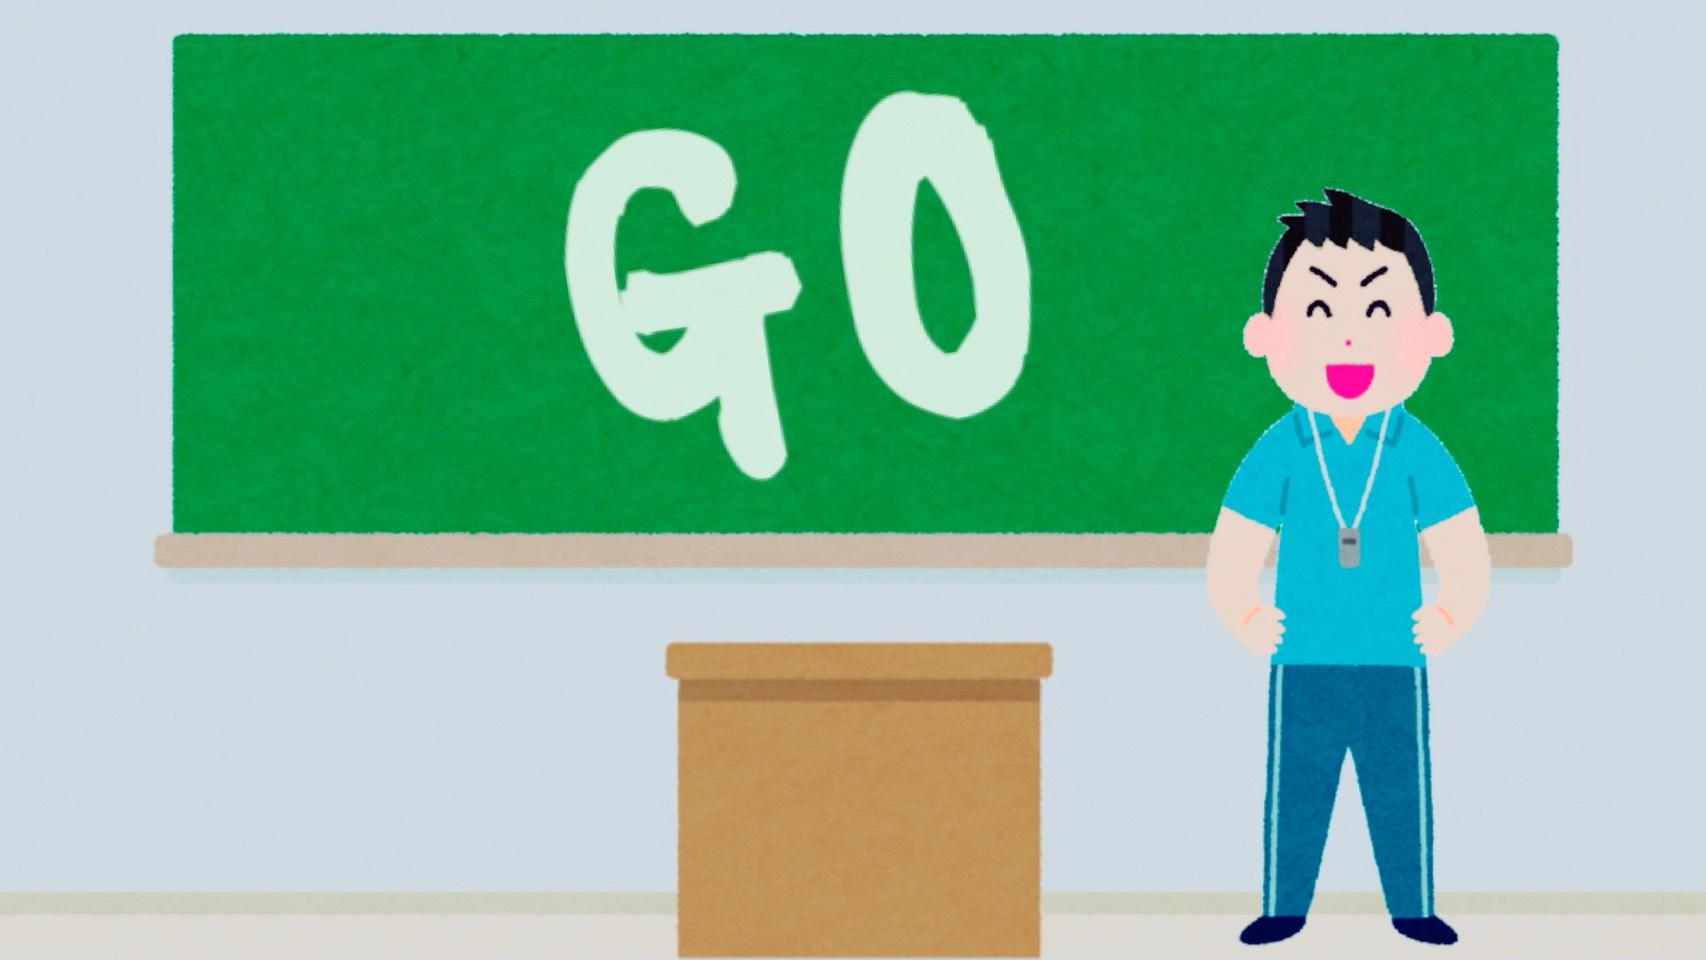 「GO」のイメージ